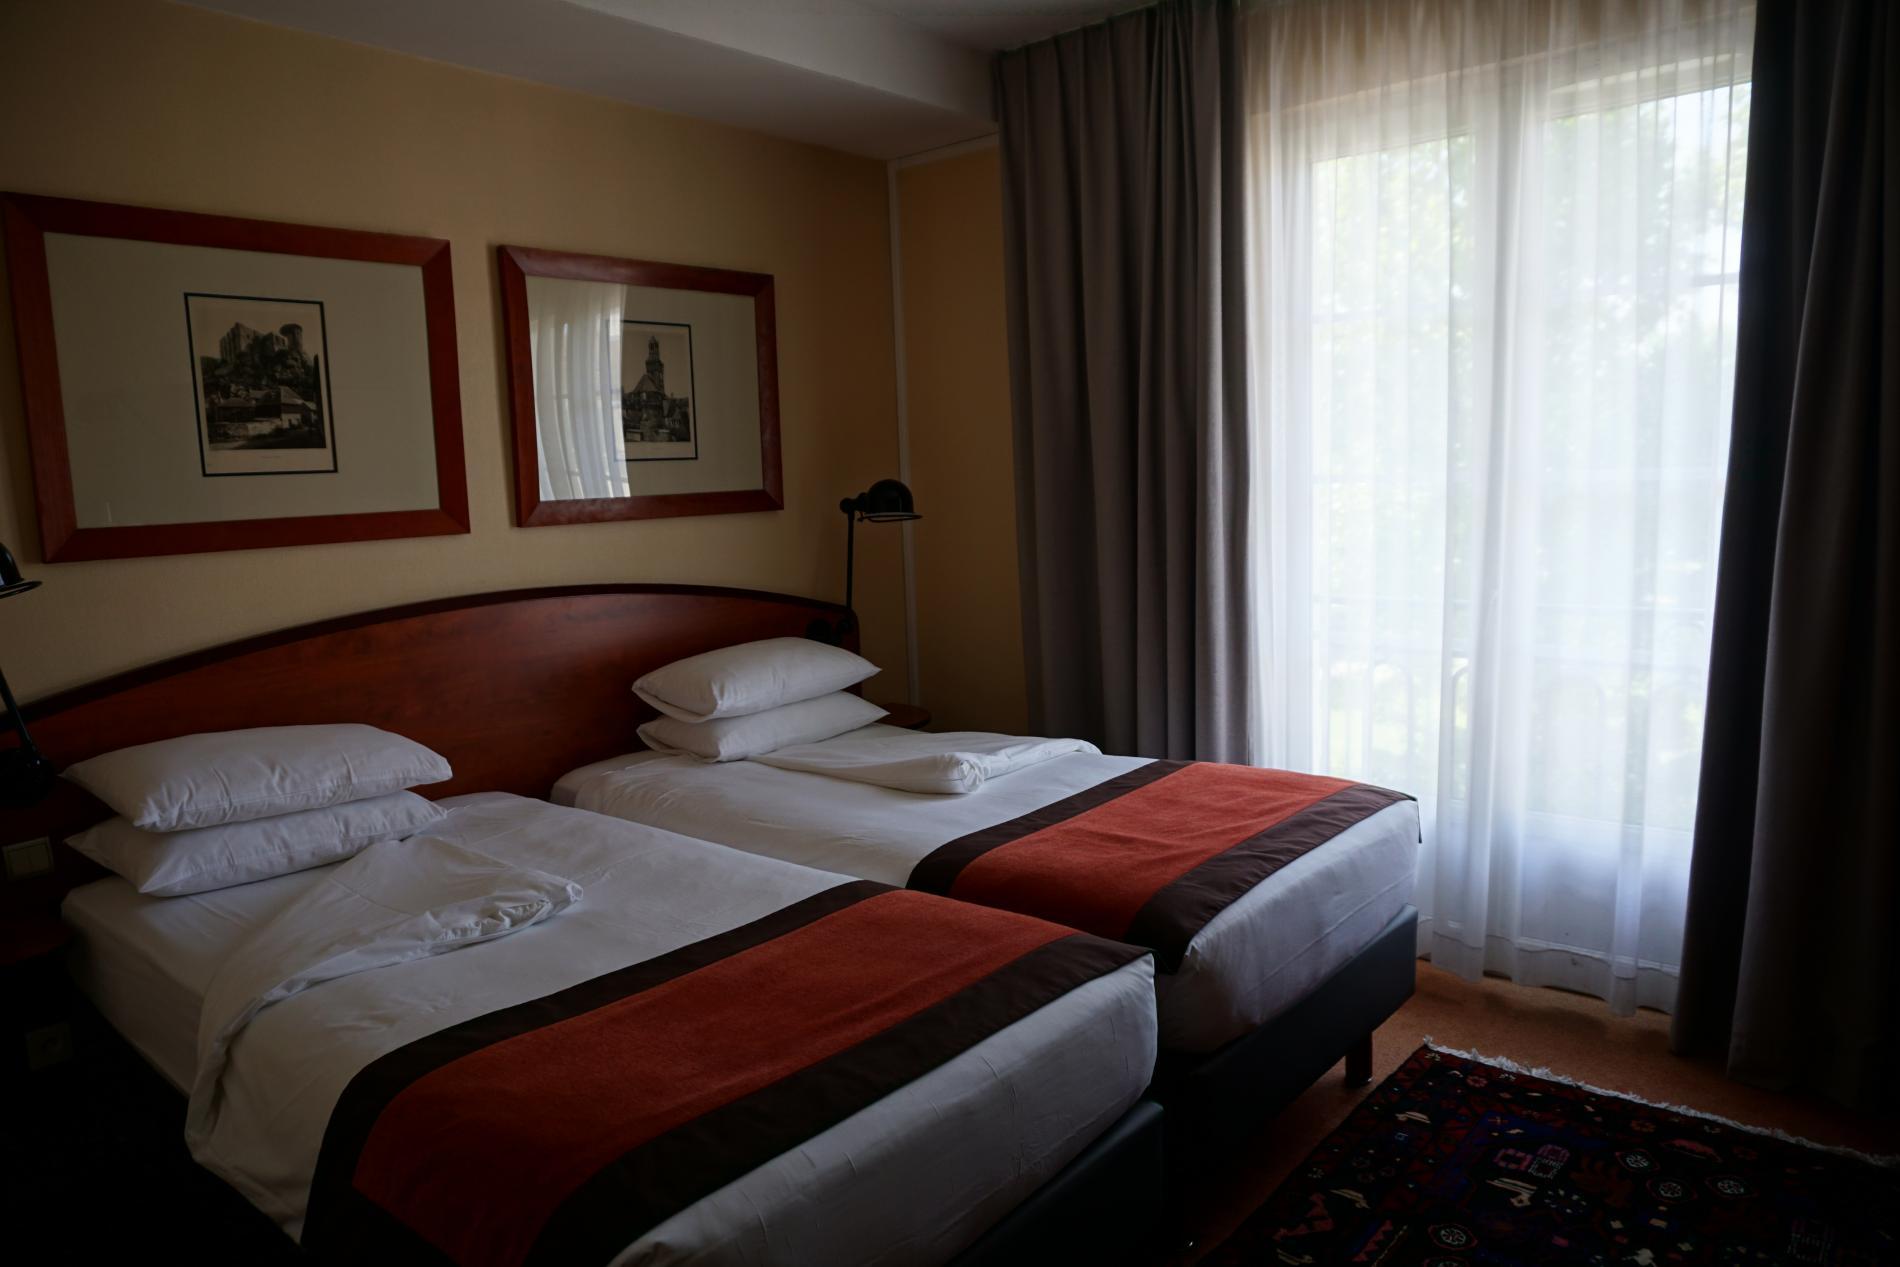 Rooms: Our Family Adjoining Rooms > Tarifs Et Offres Hôtel à Caen